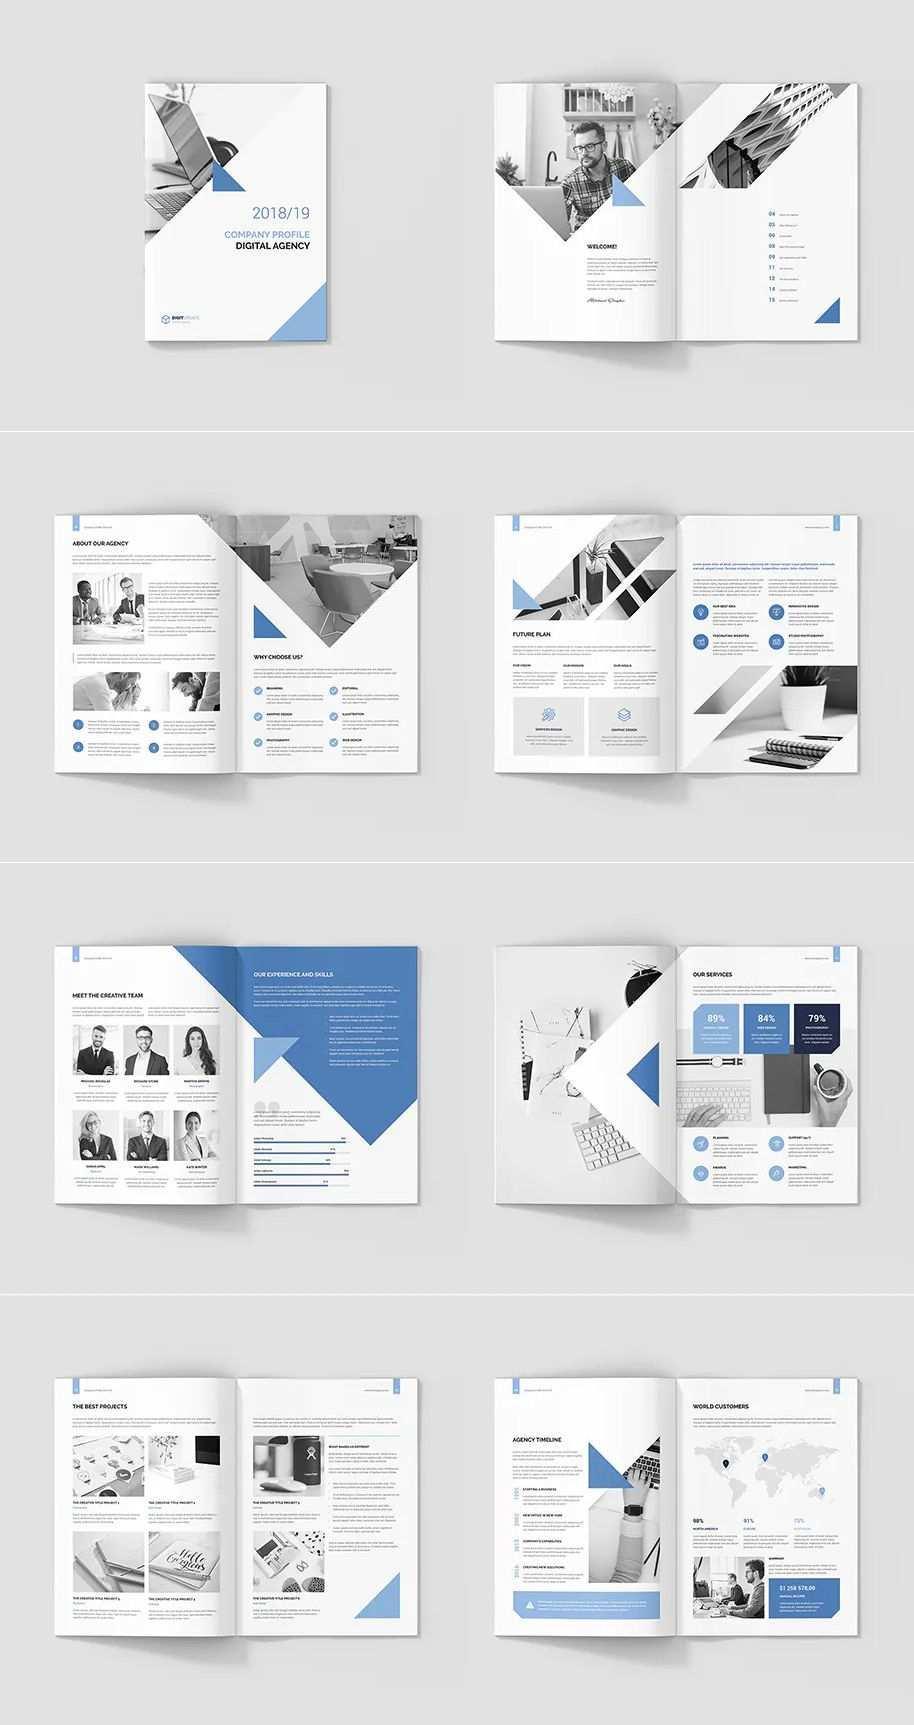 Digital Agency Company Profile Template Ebook Design Layout Company Profile Design Templates Company Profile Template